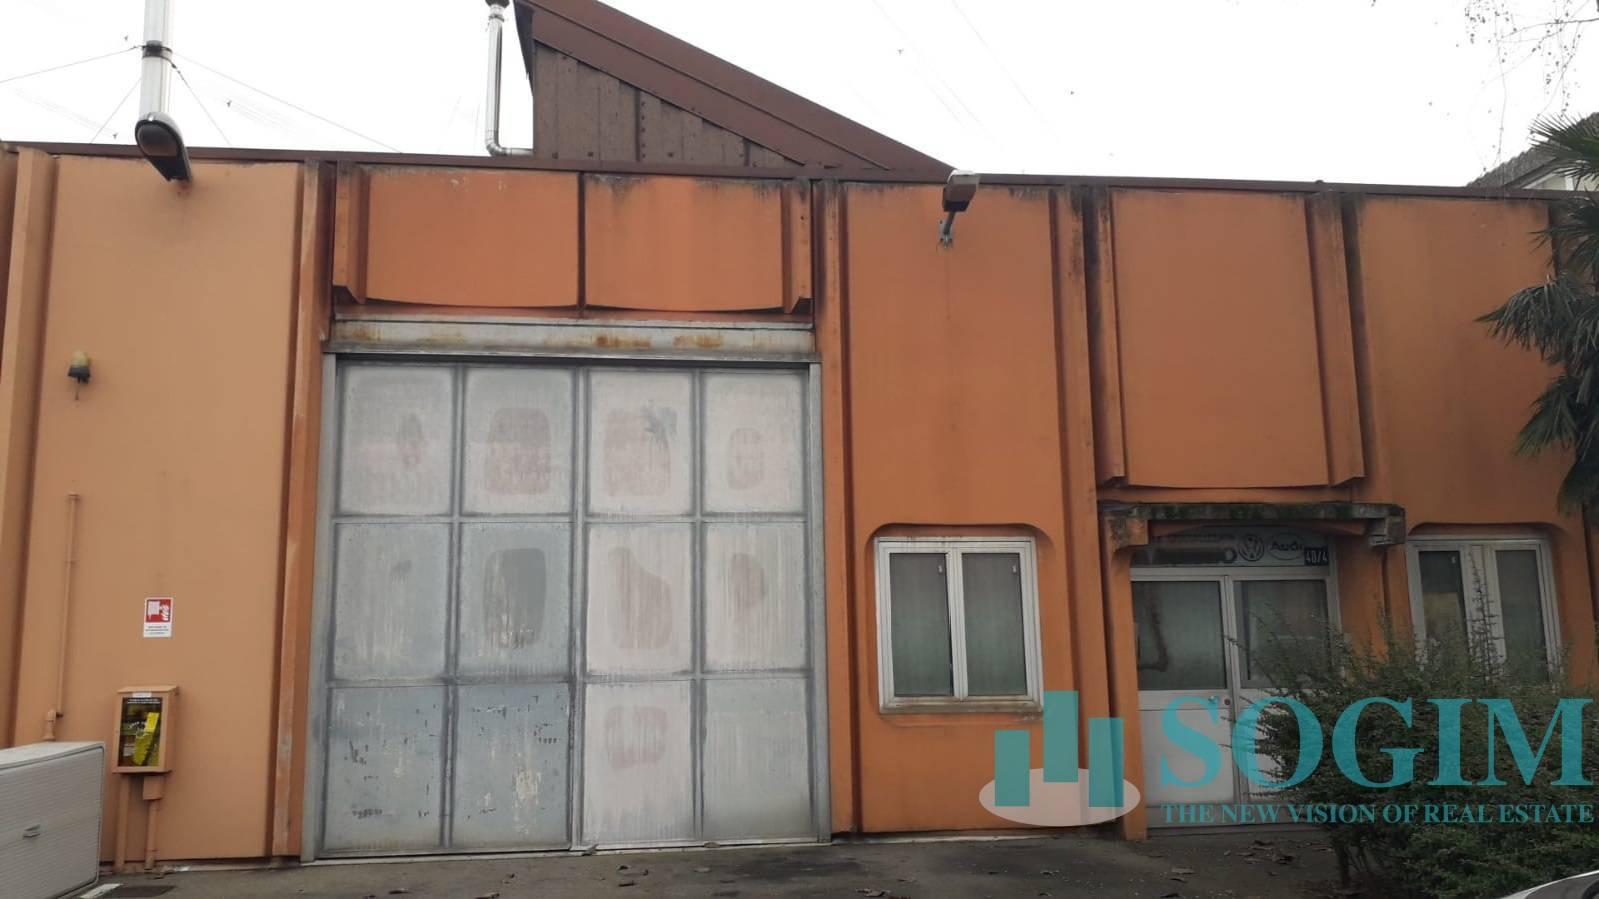 Vendita Capannone Commerciale/Industriale Arese 261591